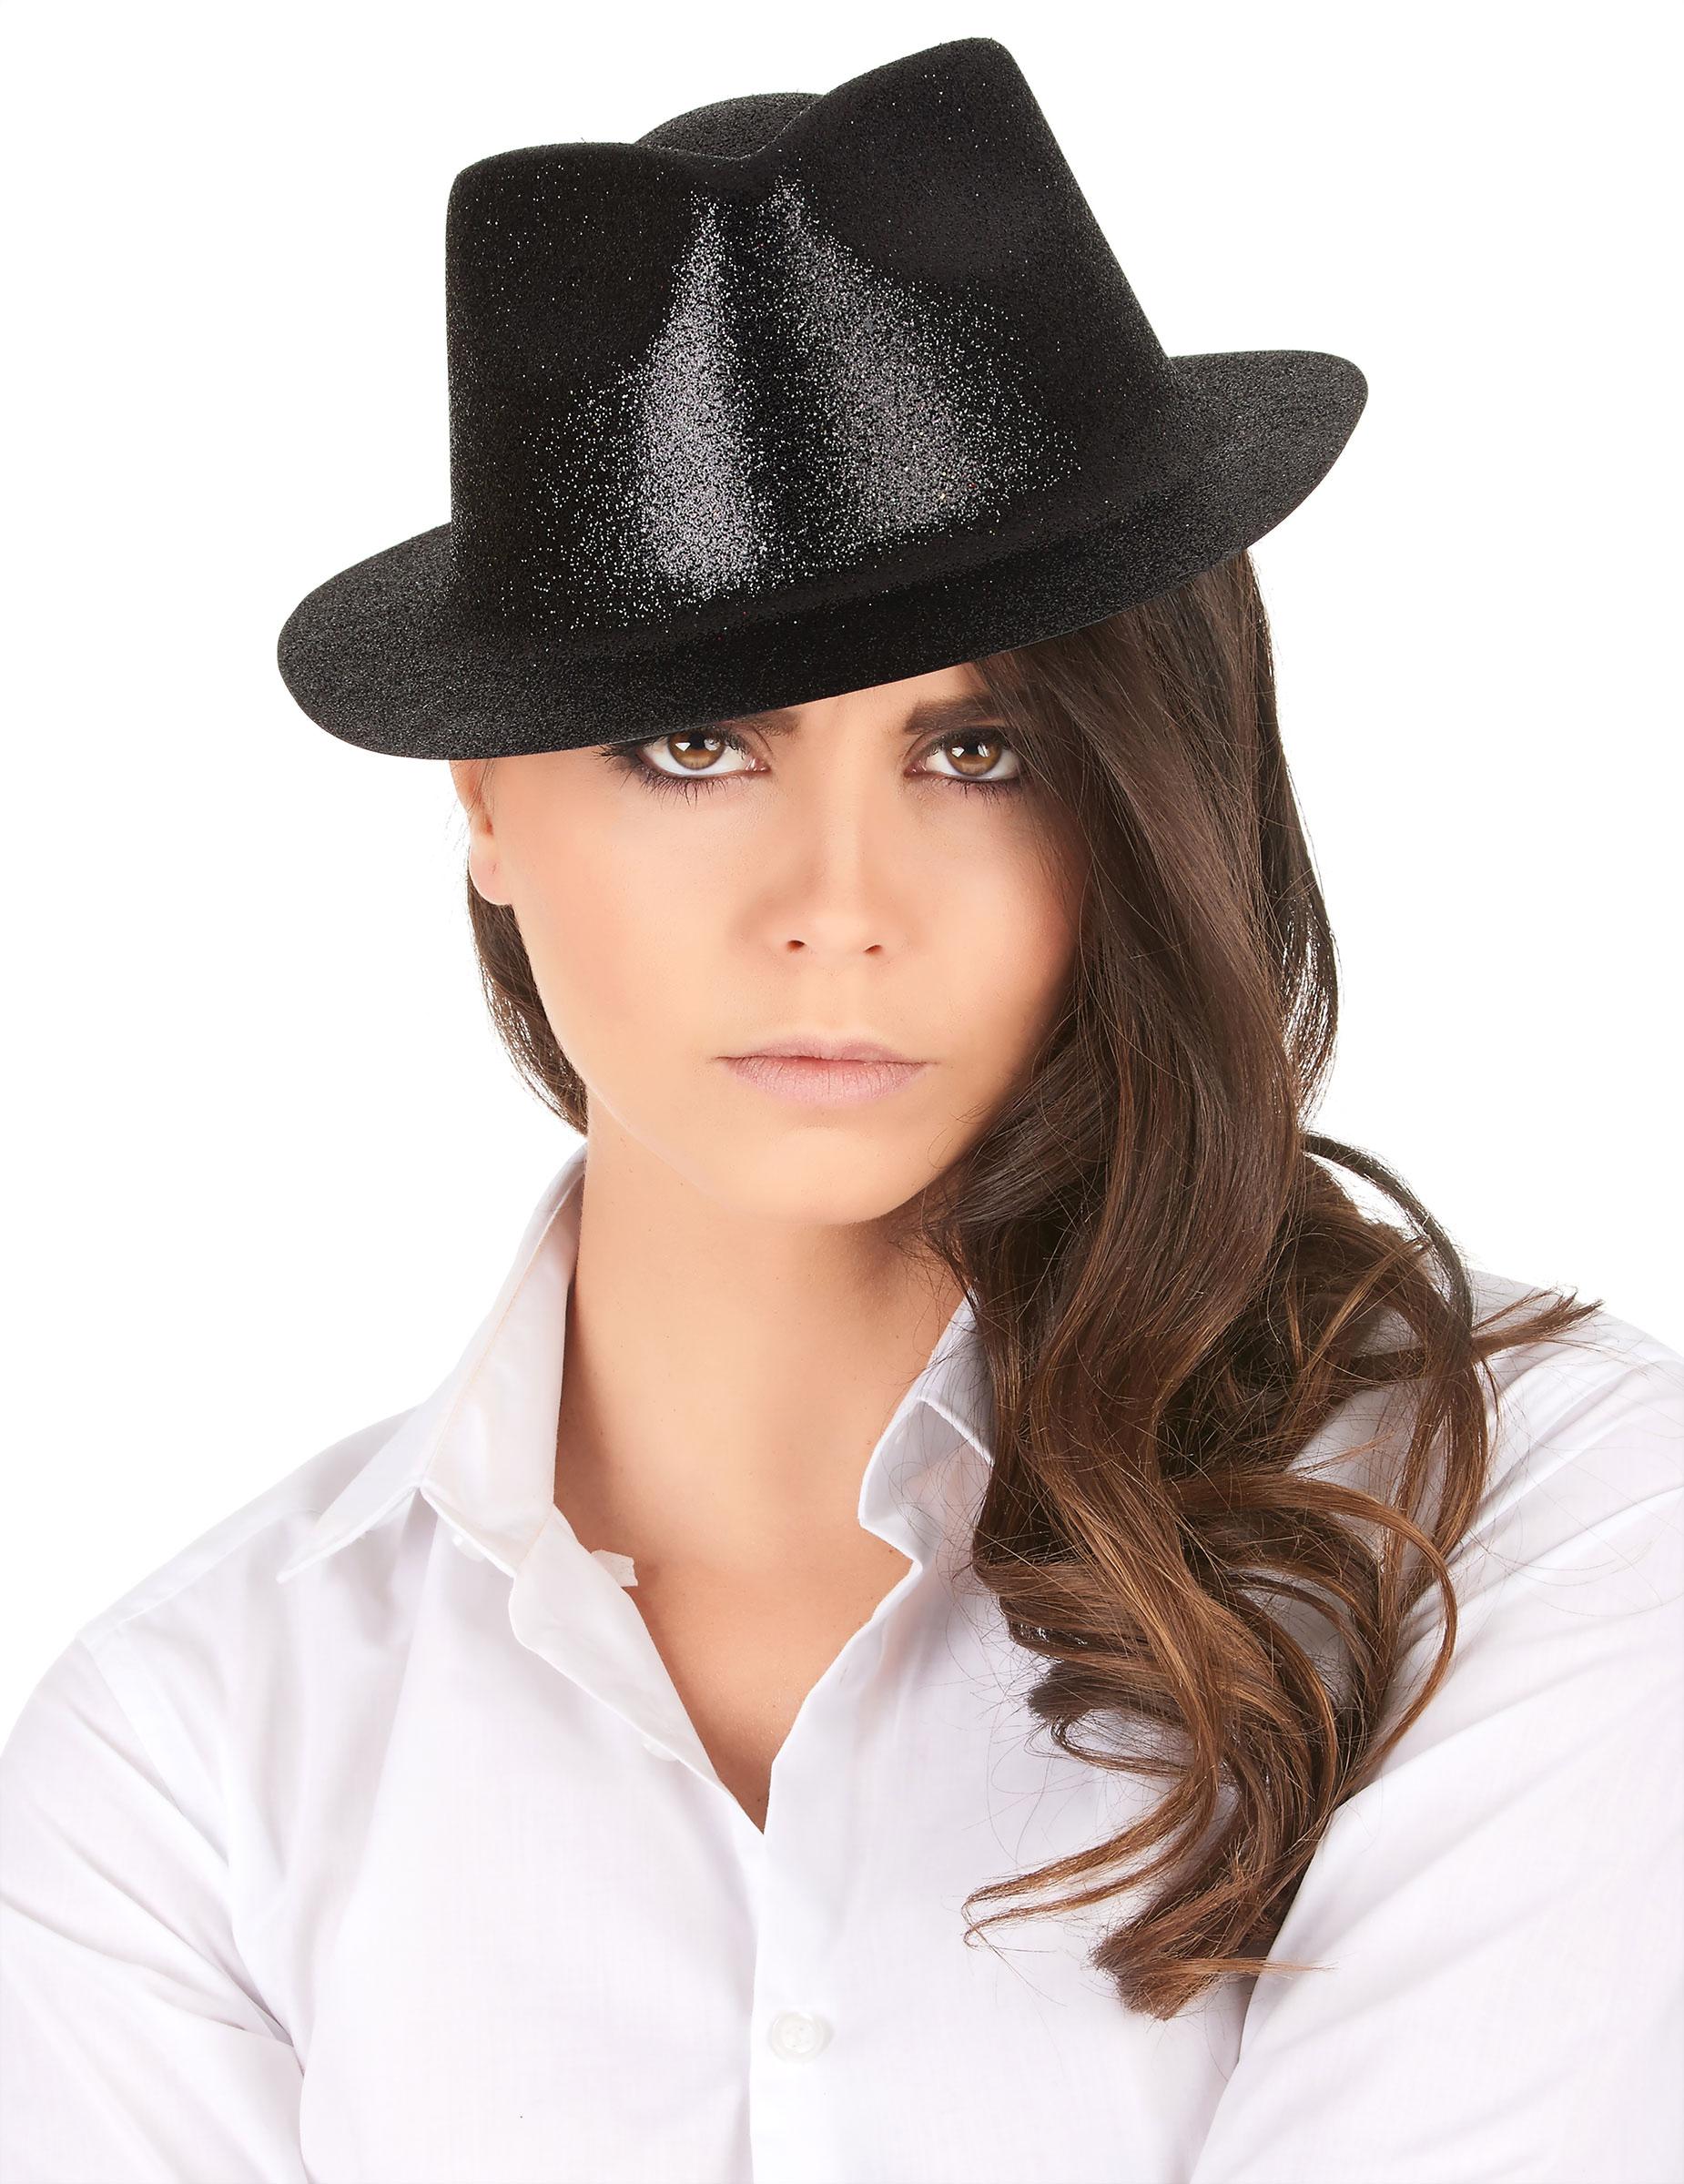 Glitzer Party Hut schwarz - stylishe Accessoires bei VEGAOO